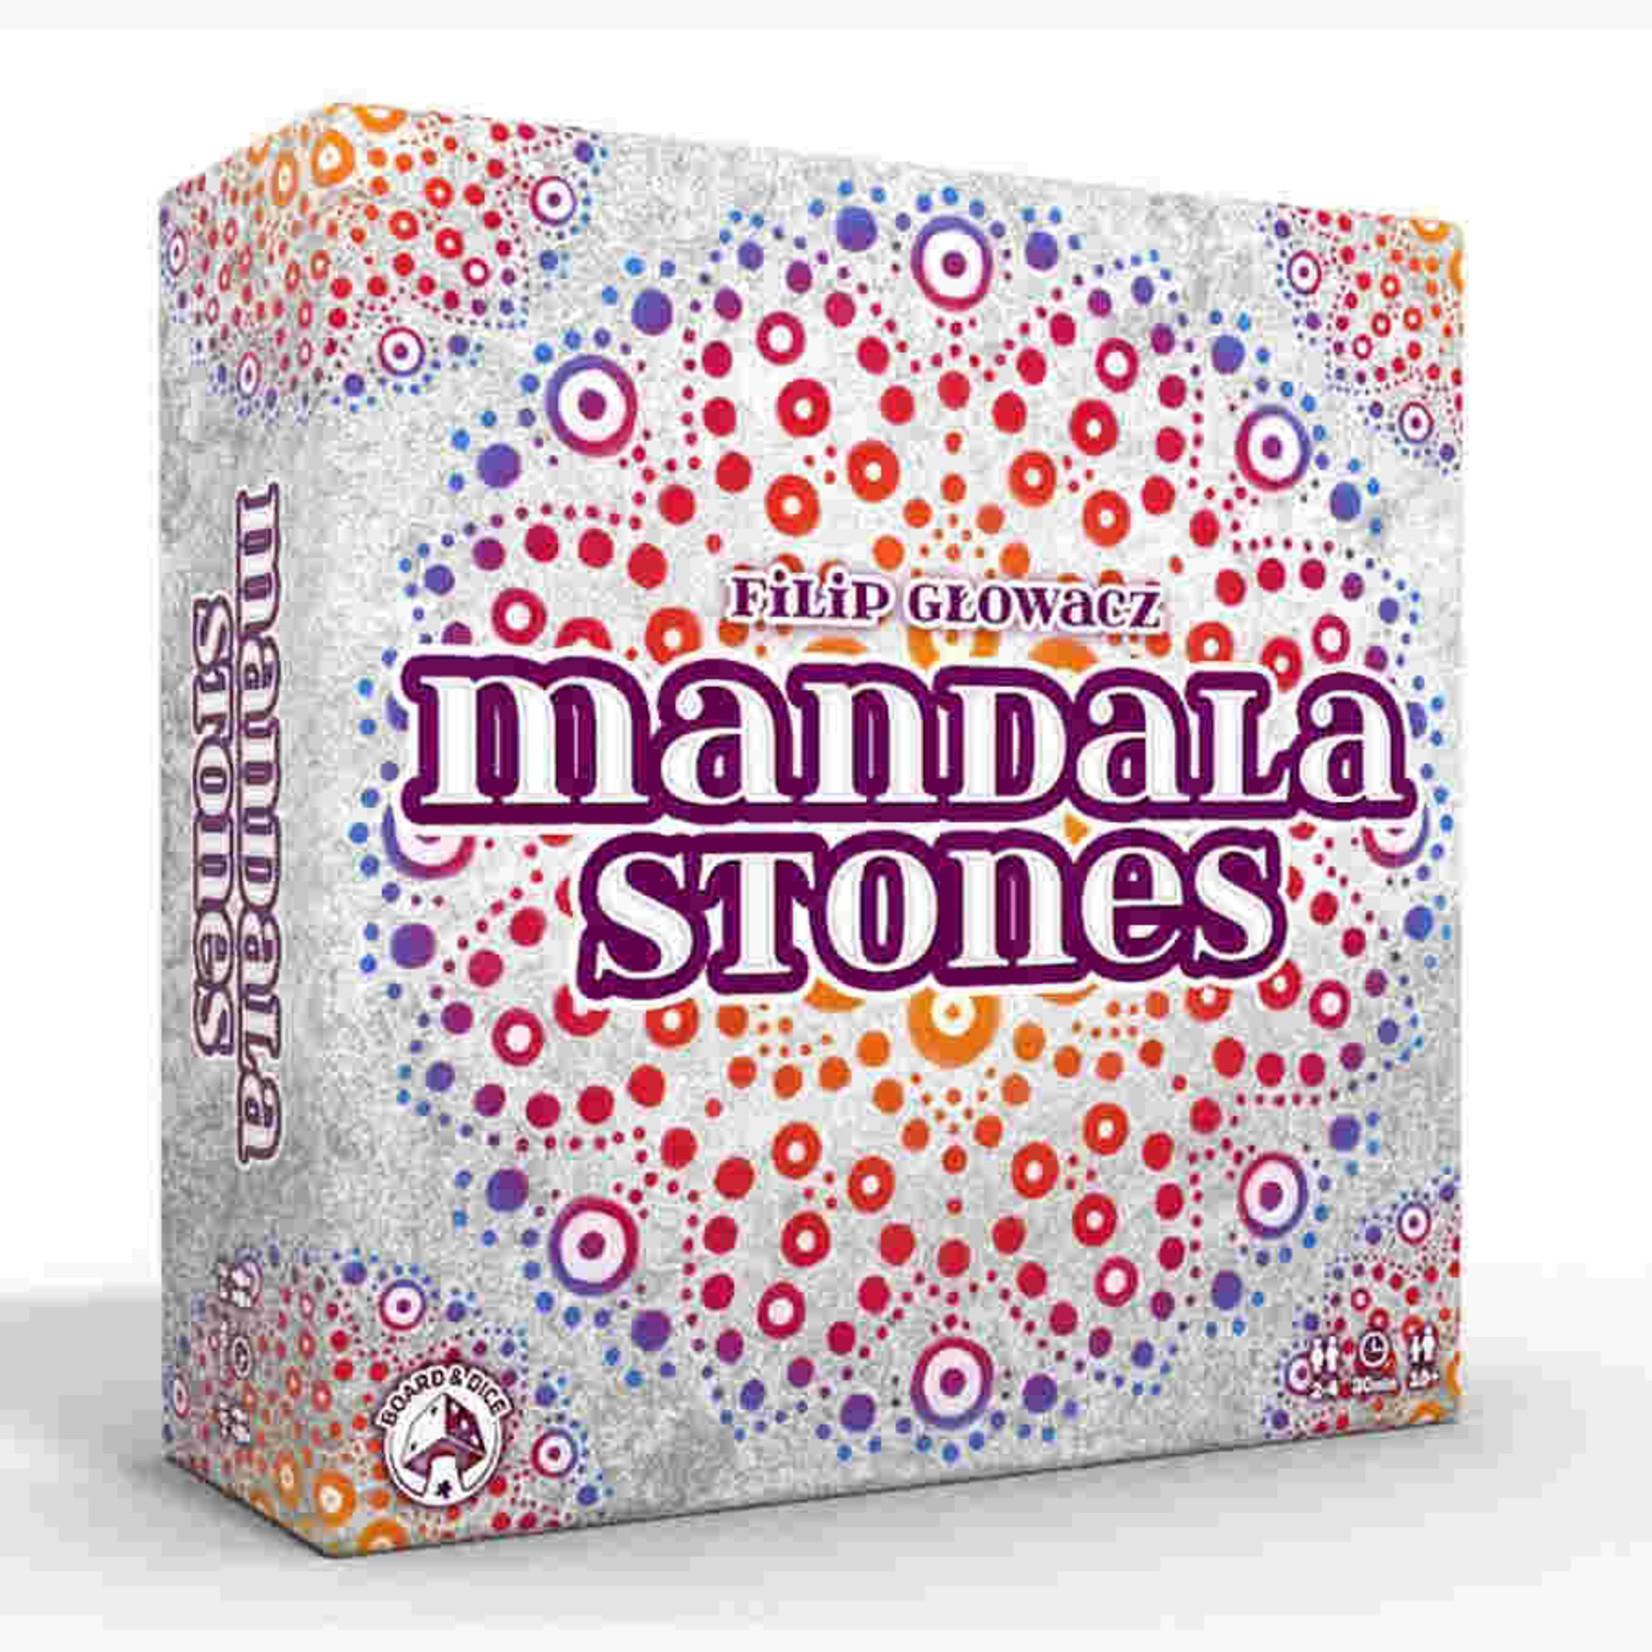 Board and Dice Mandala Stones